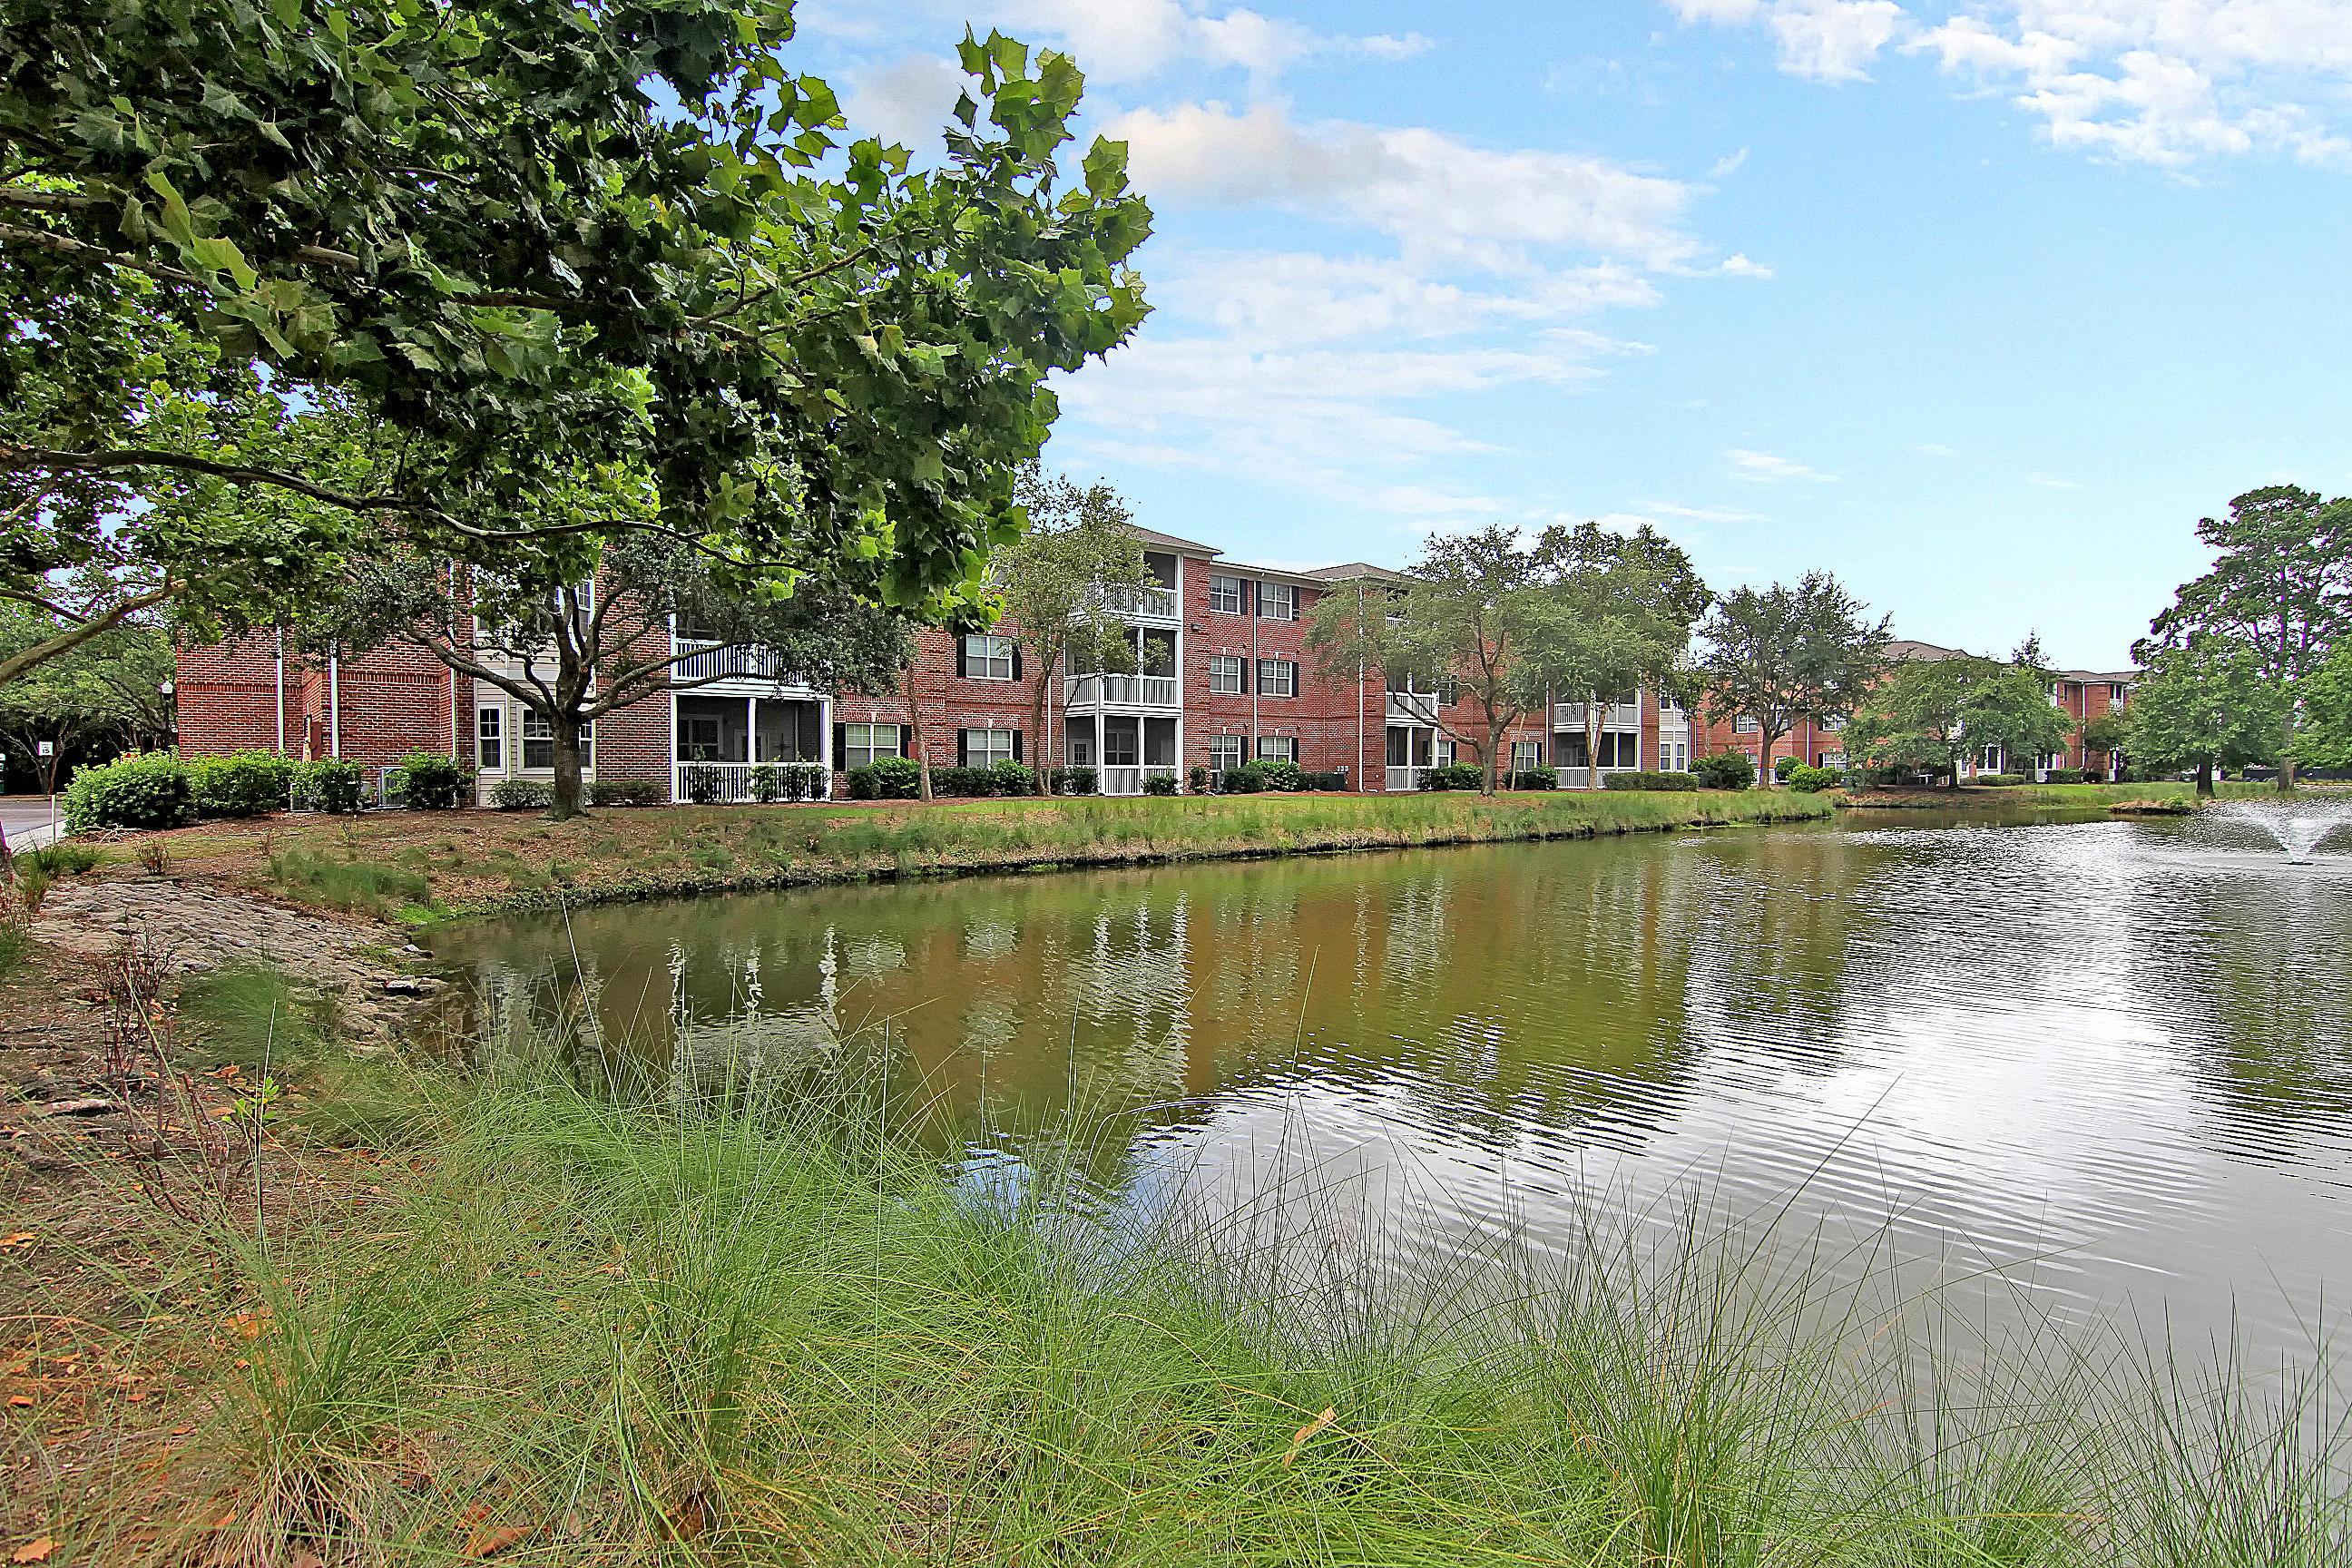 Cambridge Lakes Homes For Sale - 1445 Cambridge Lakes, Mount Pleasant, SC - 1